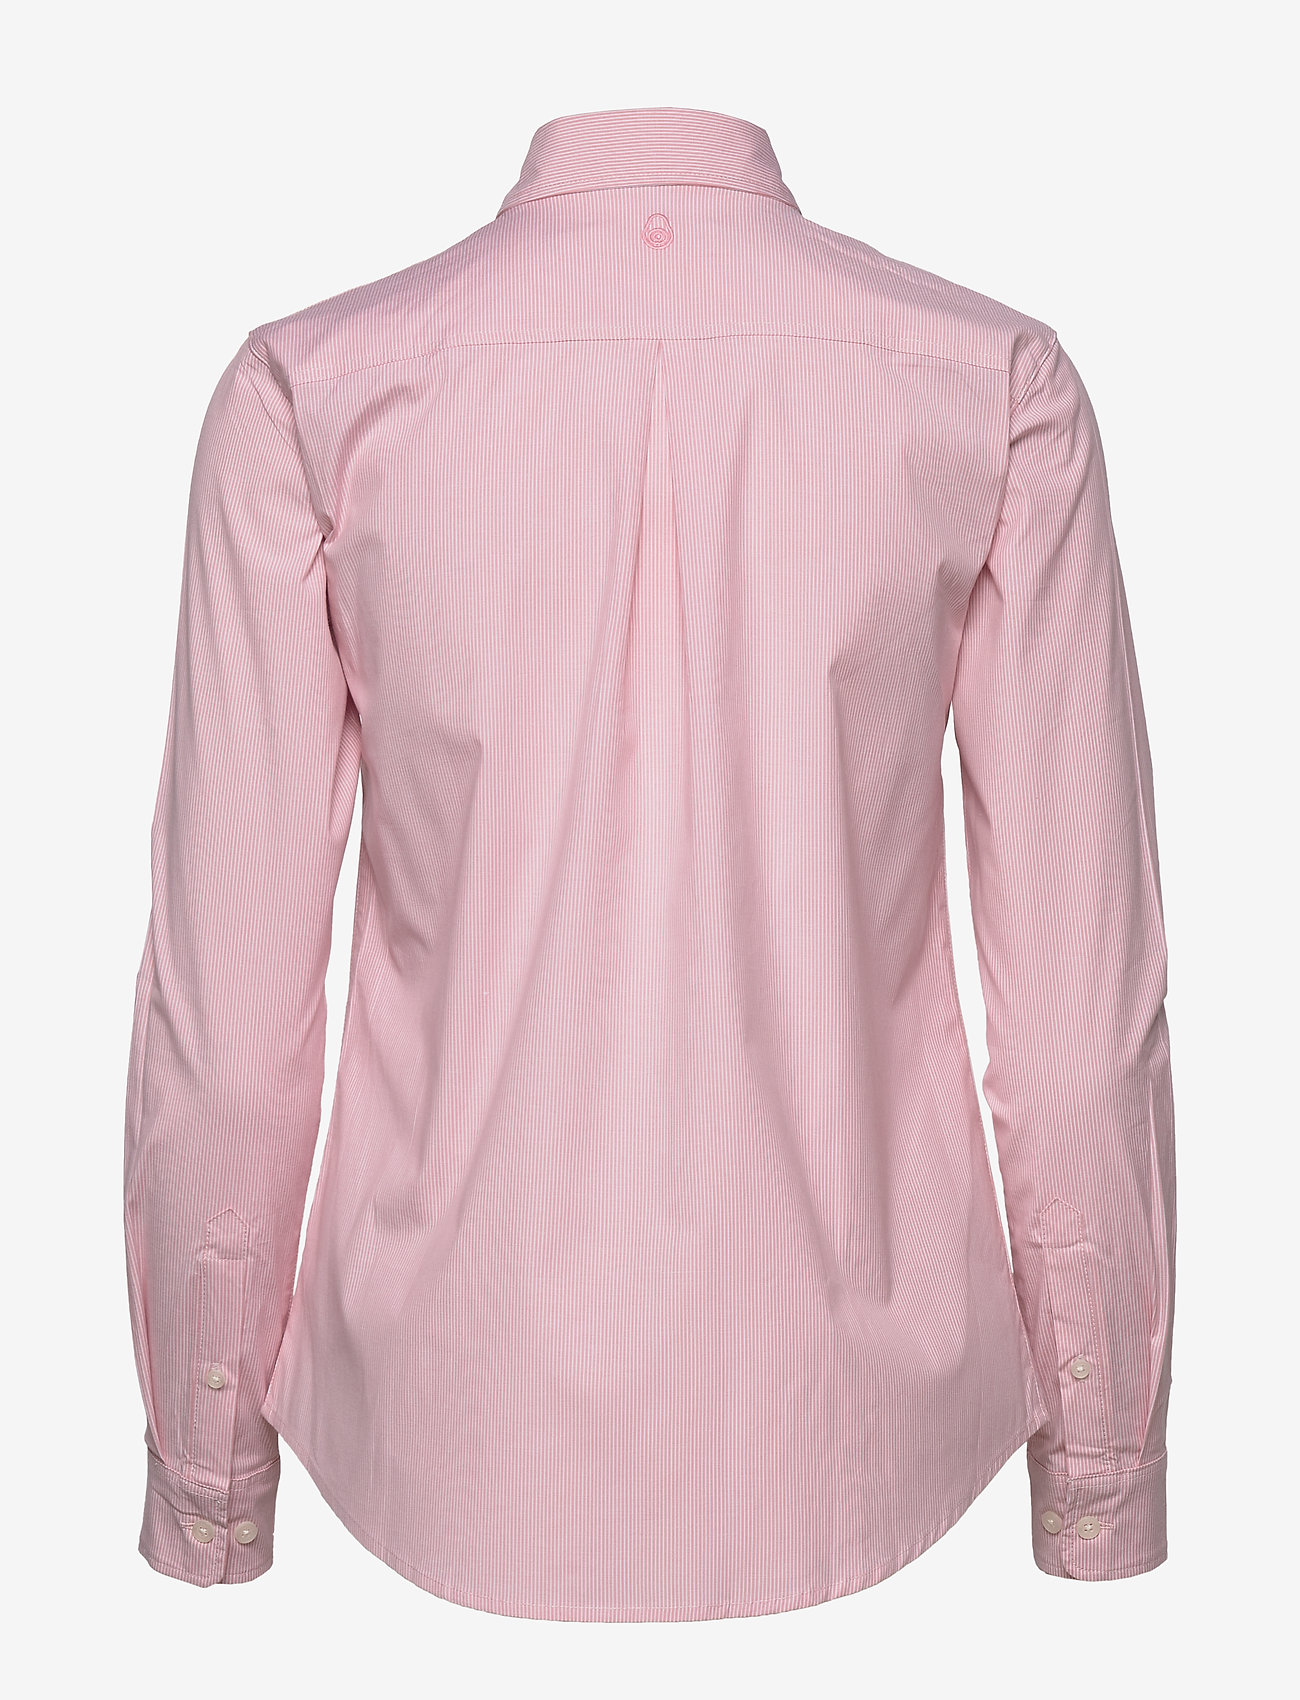 Sail Racing - W GALE STRIPED SHIRT - long-sleeved shirts - light pink - 1